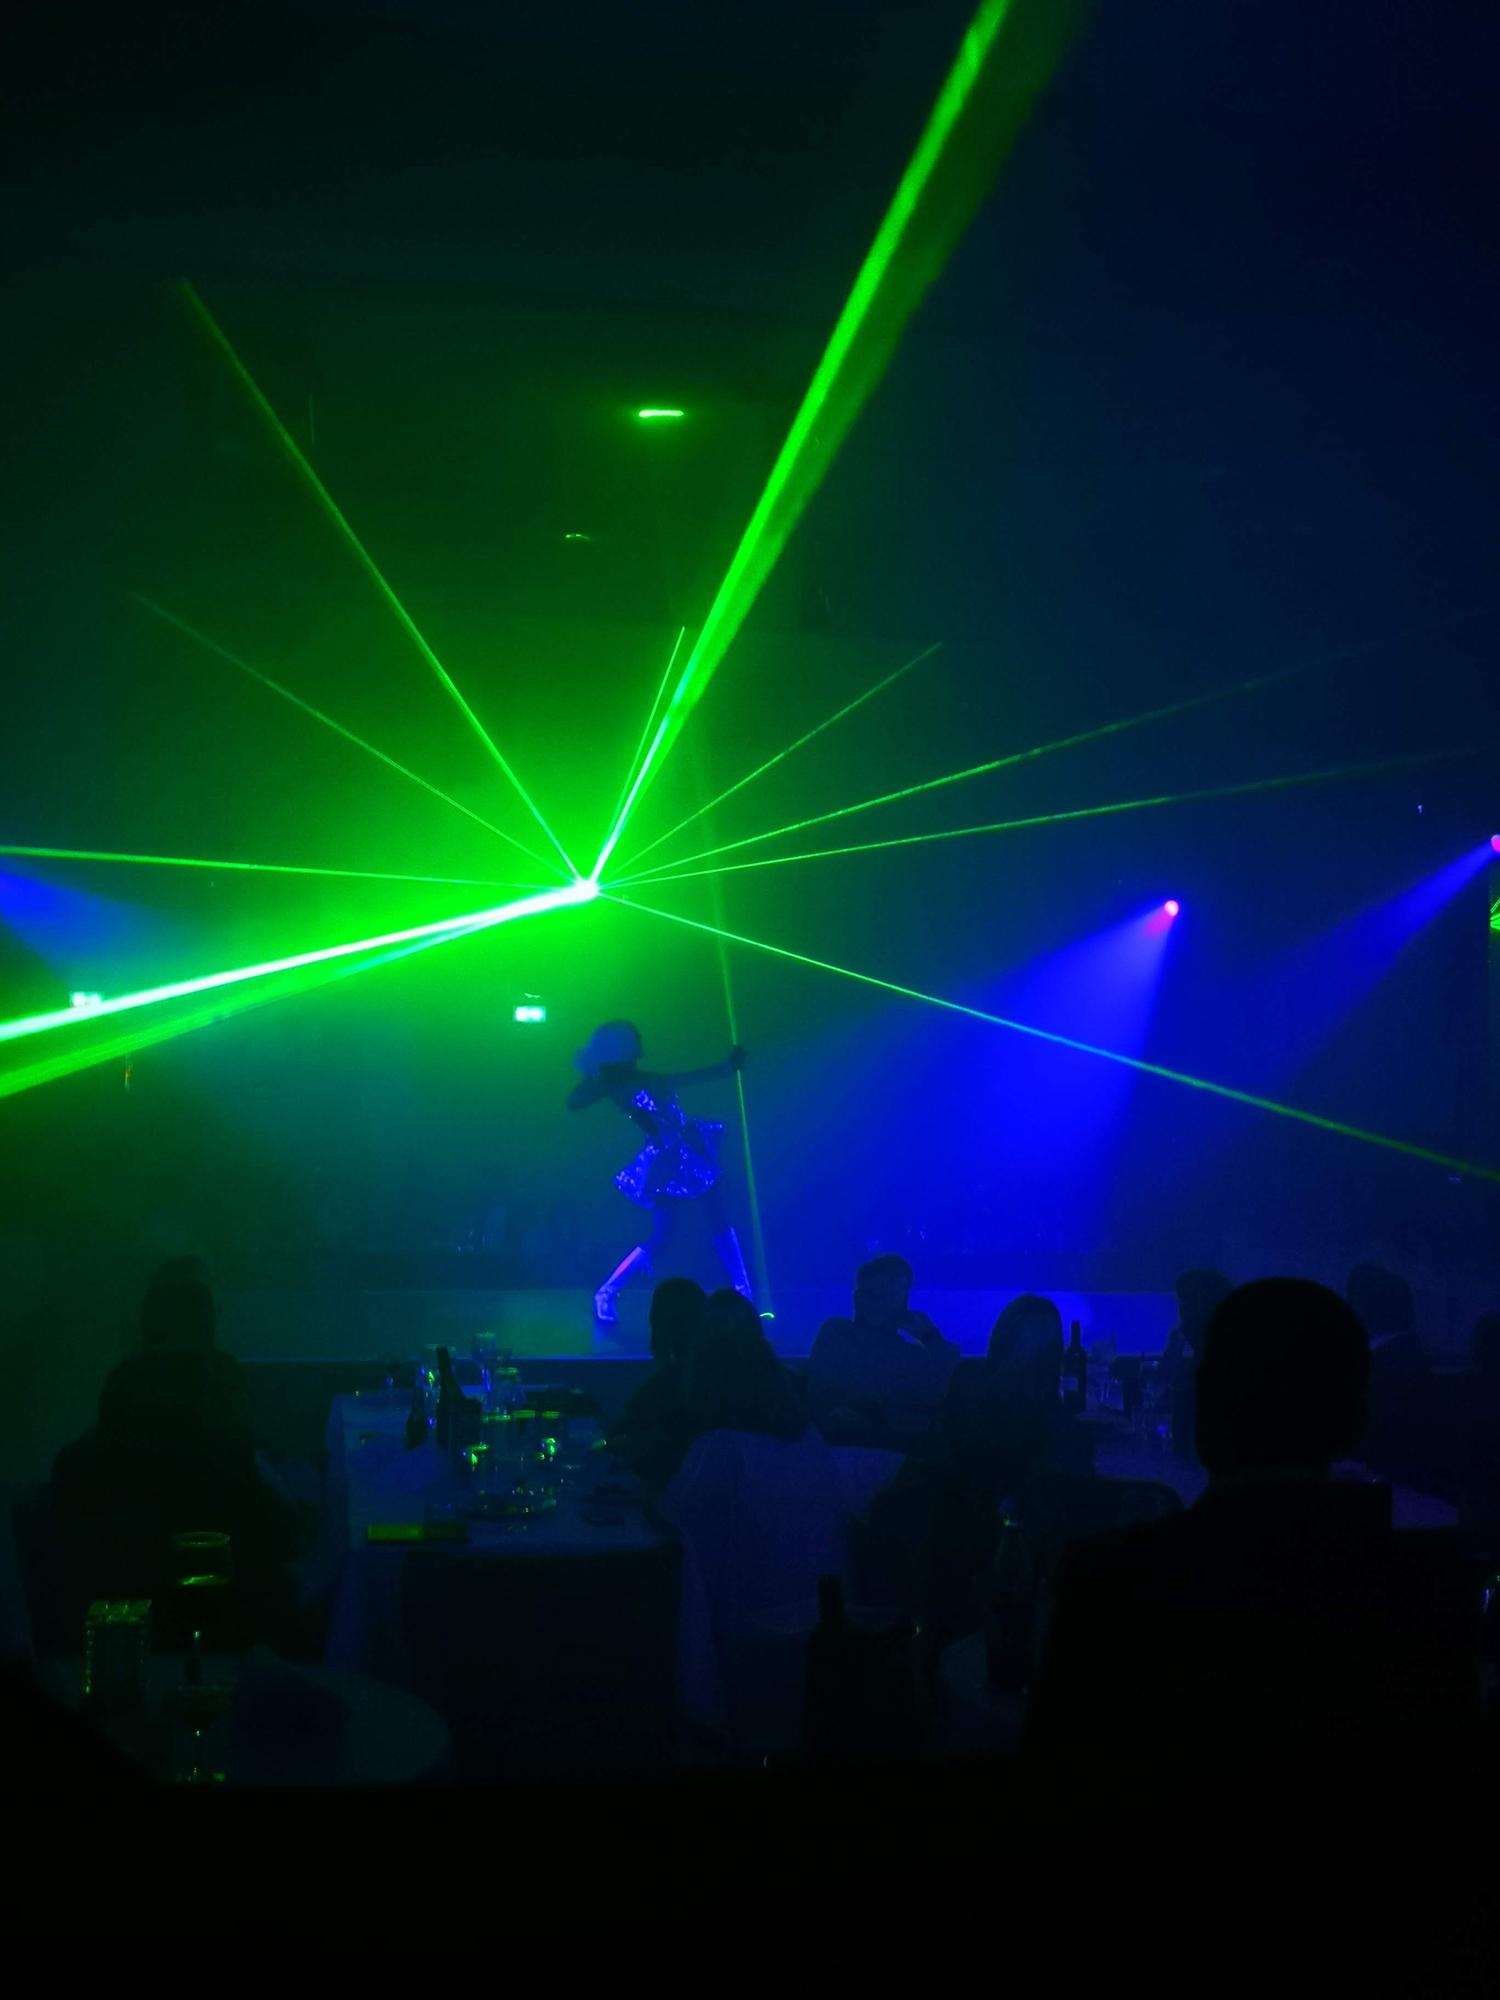 London_Cabaret_Club_London_Never_Dies_Laser